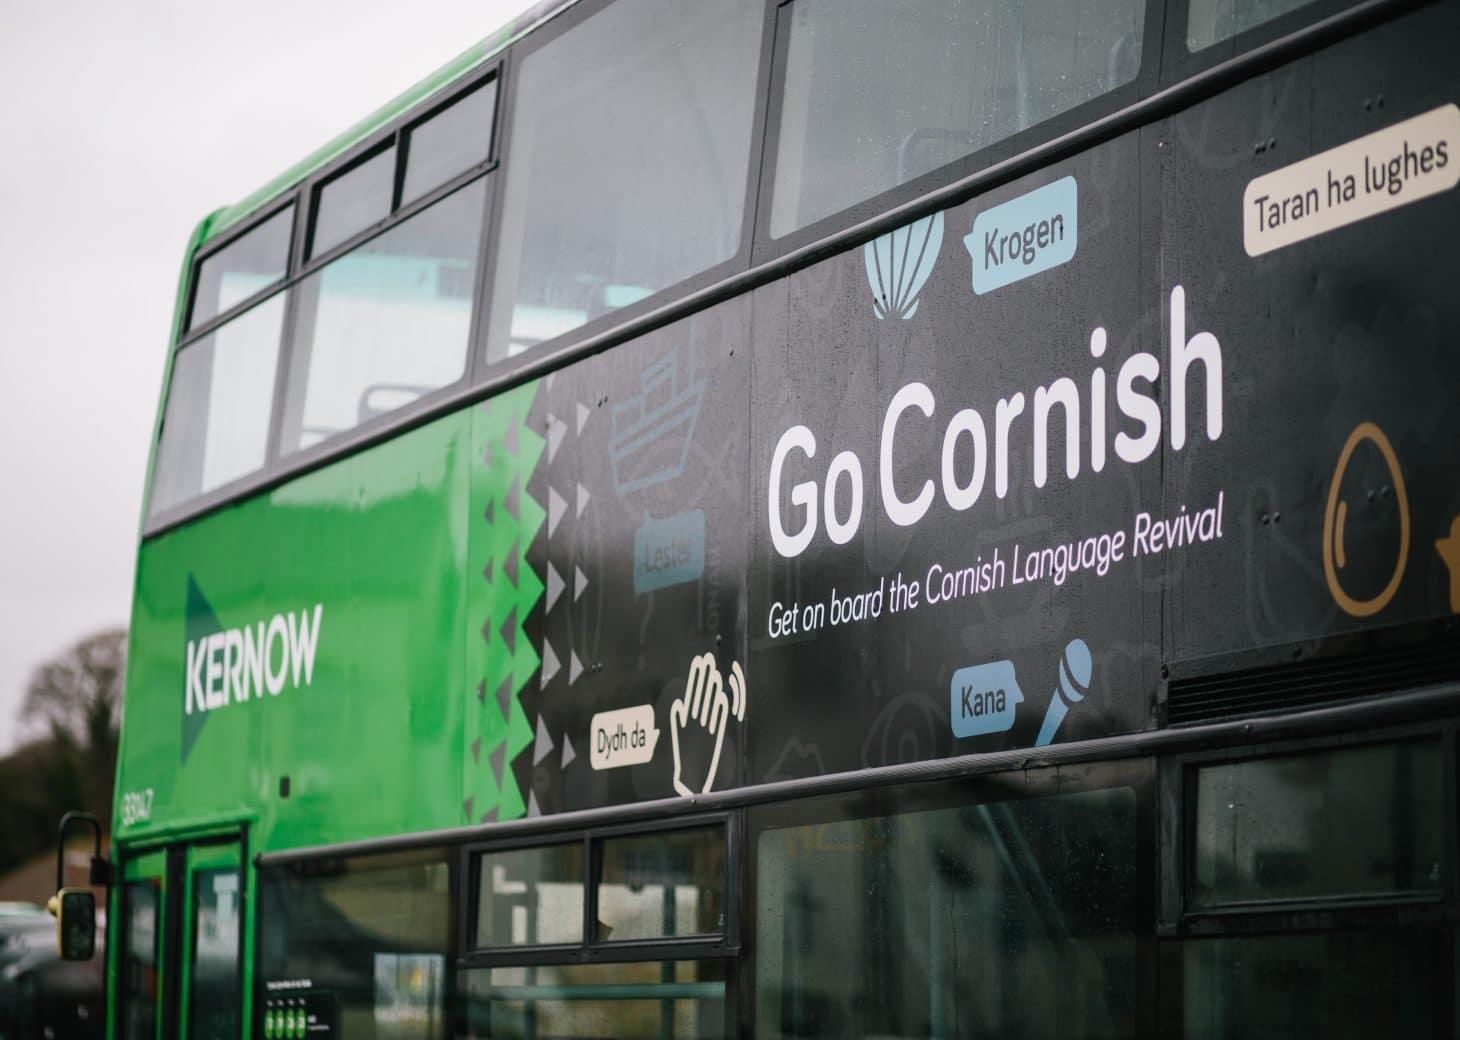 Go Cornish Launch Event